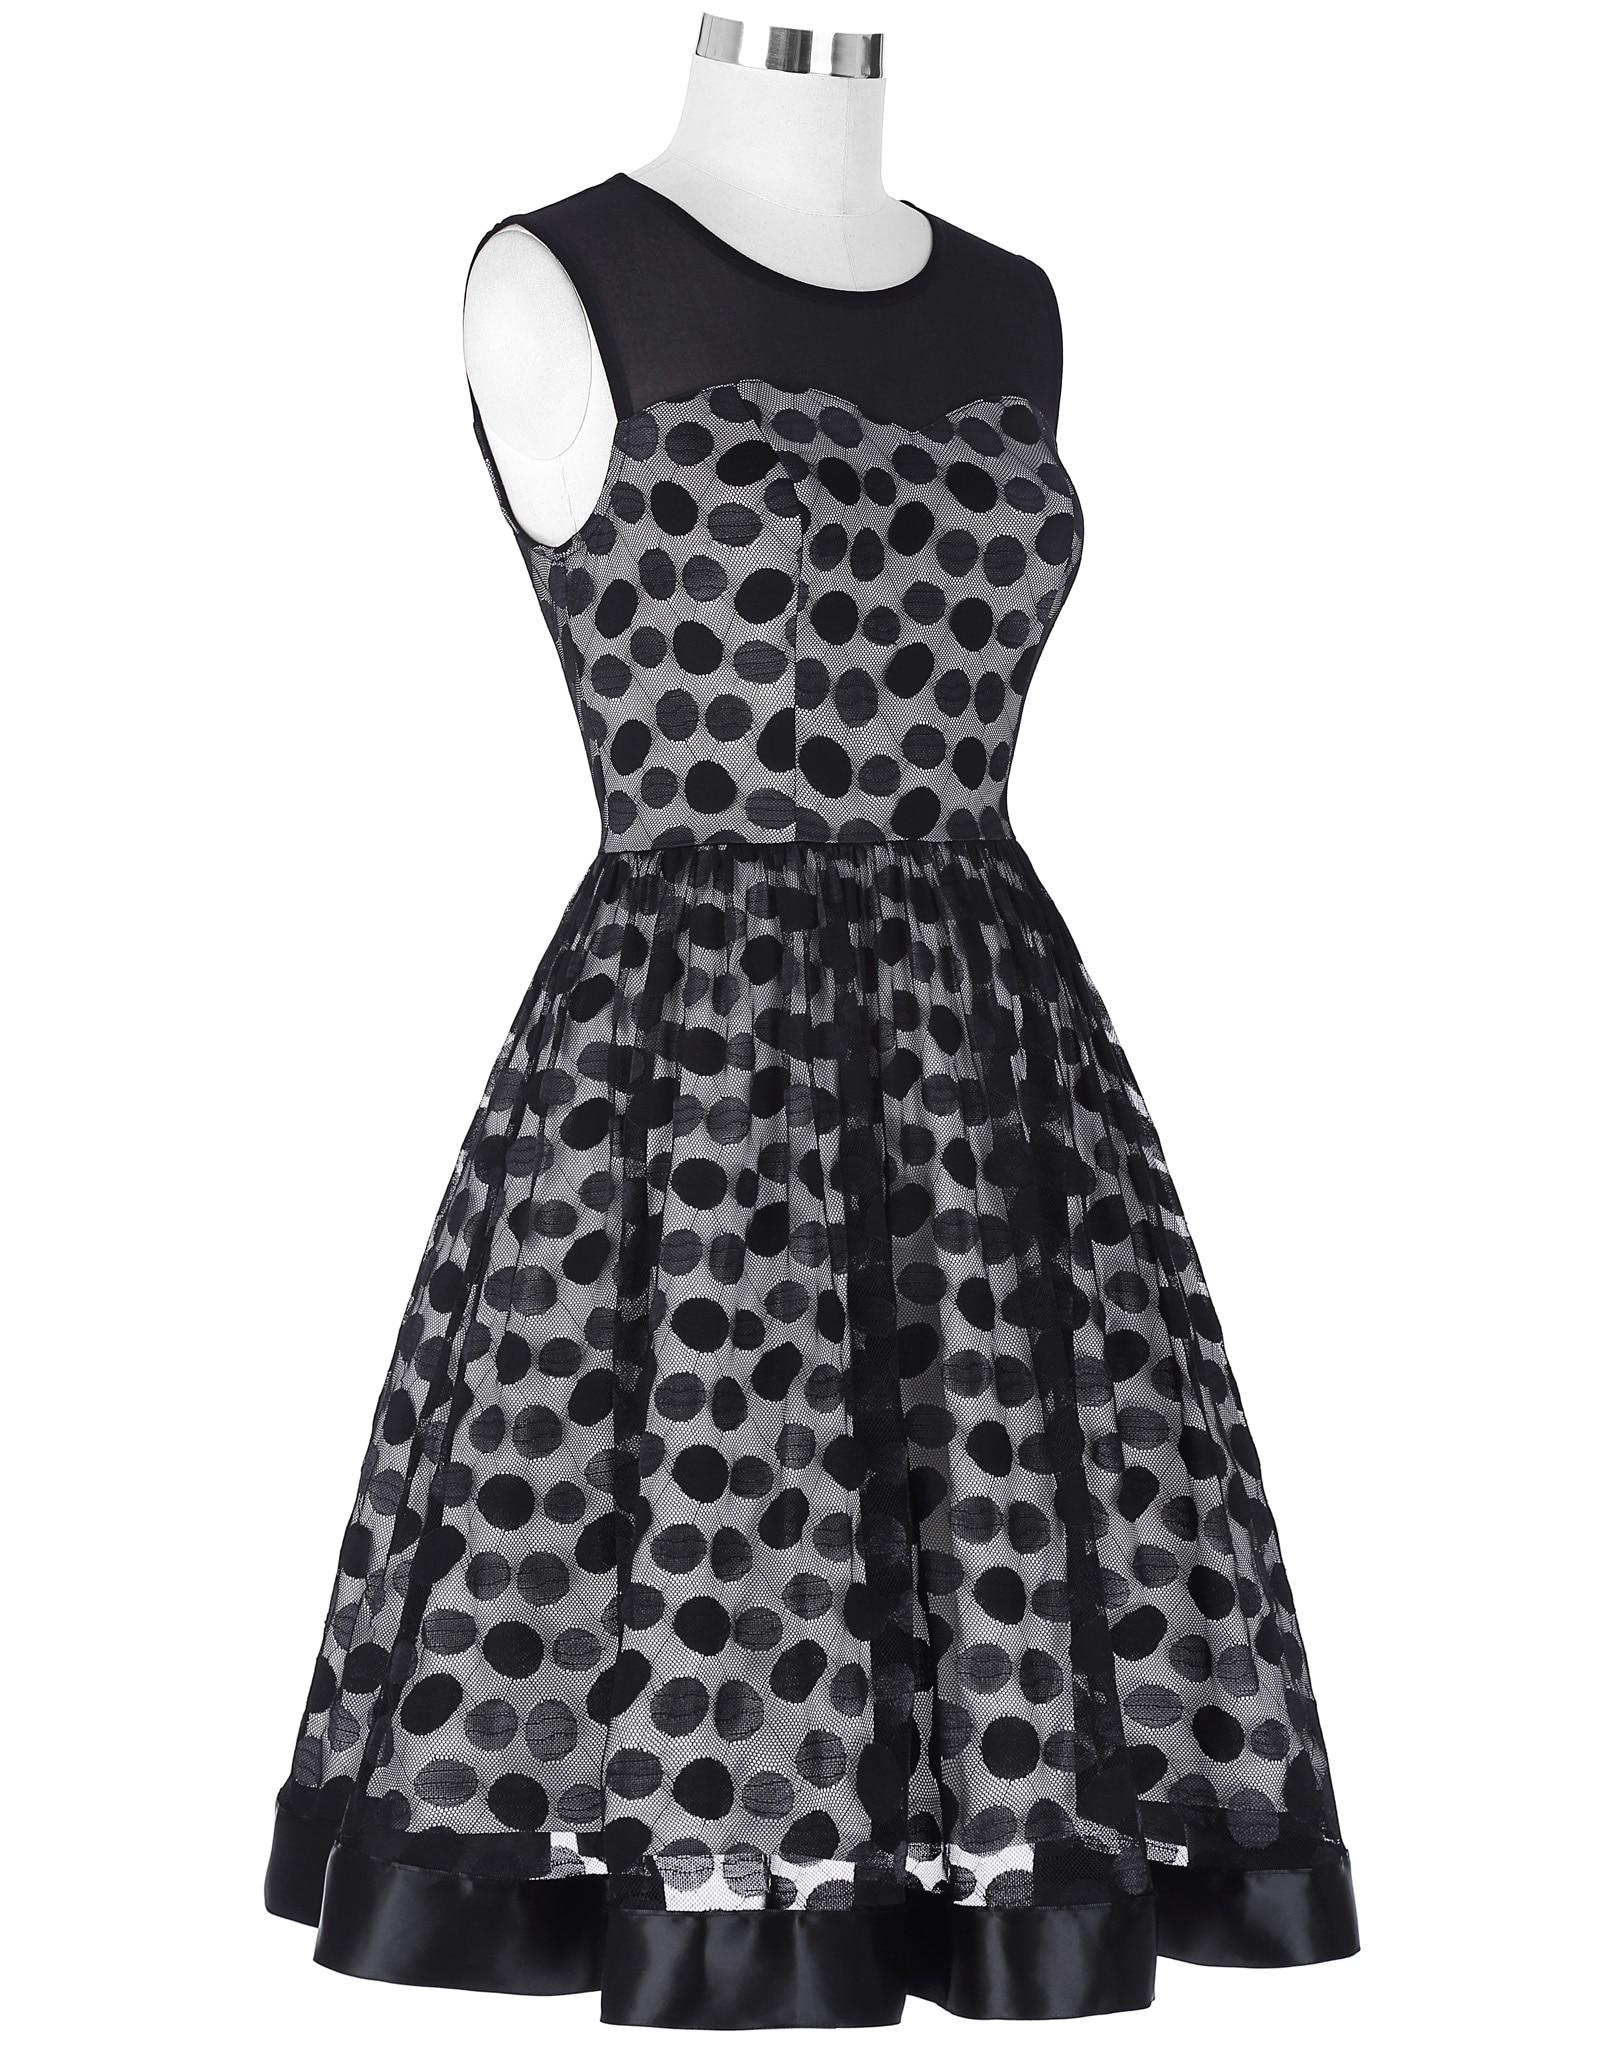 52018 summer dress women Retro 50s 60s Vintage Sleeveless Mesh Fabric Polka Dots Party a line Dress elegant ladies vestiods